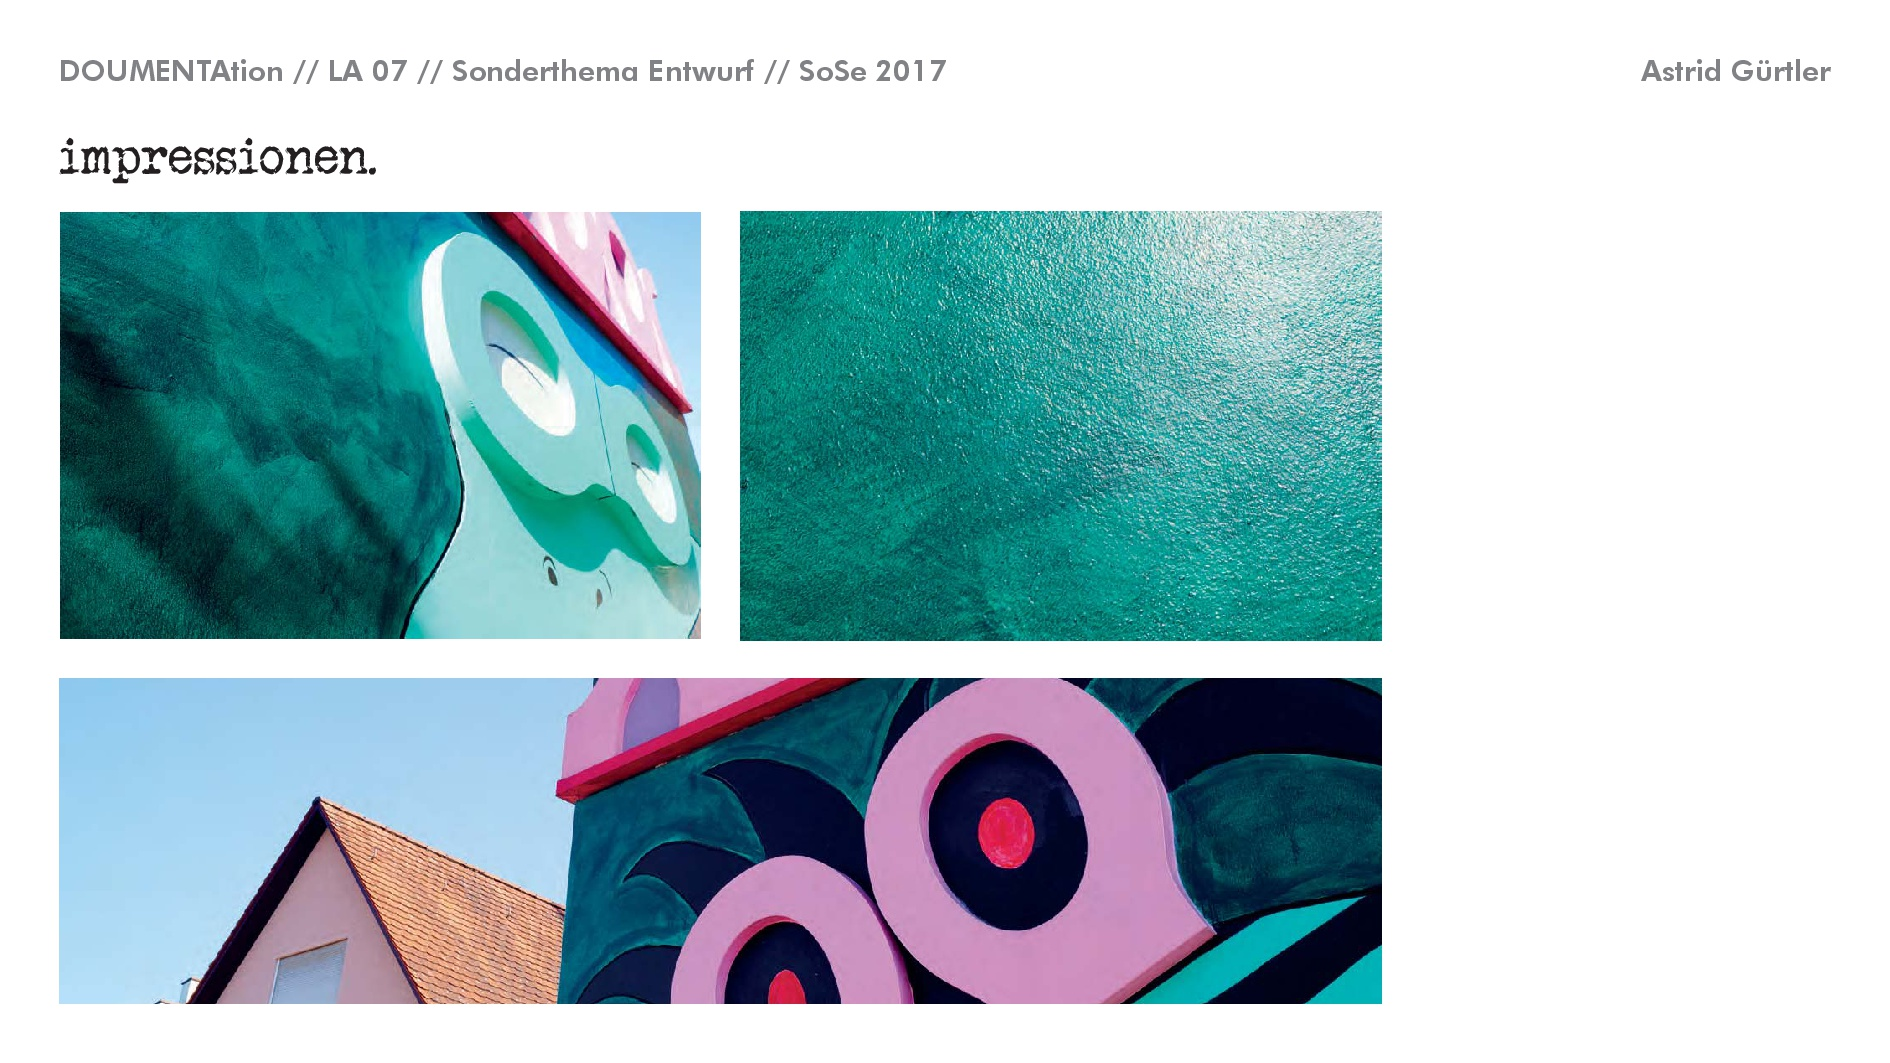 NEU Sonderthema Entwerfen SoSe 17 026